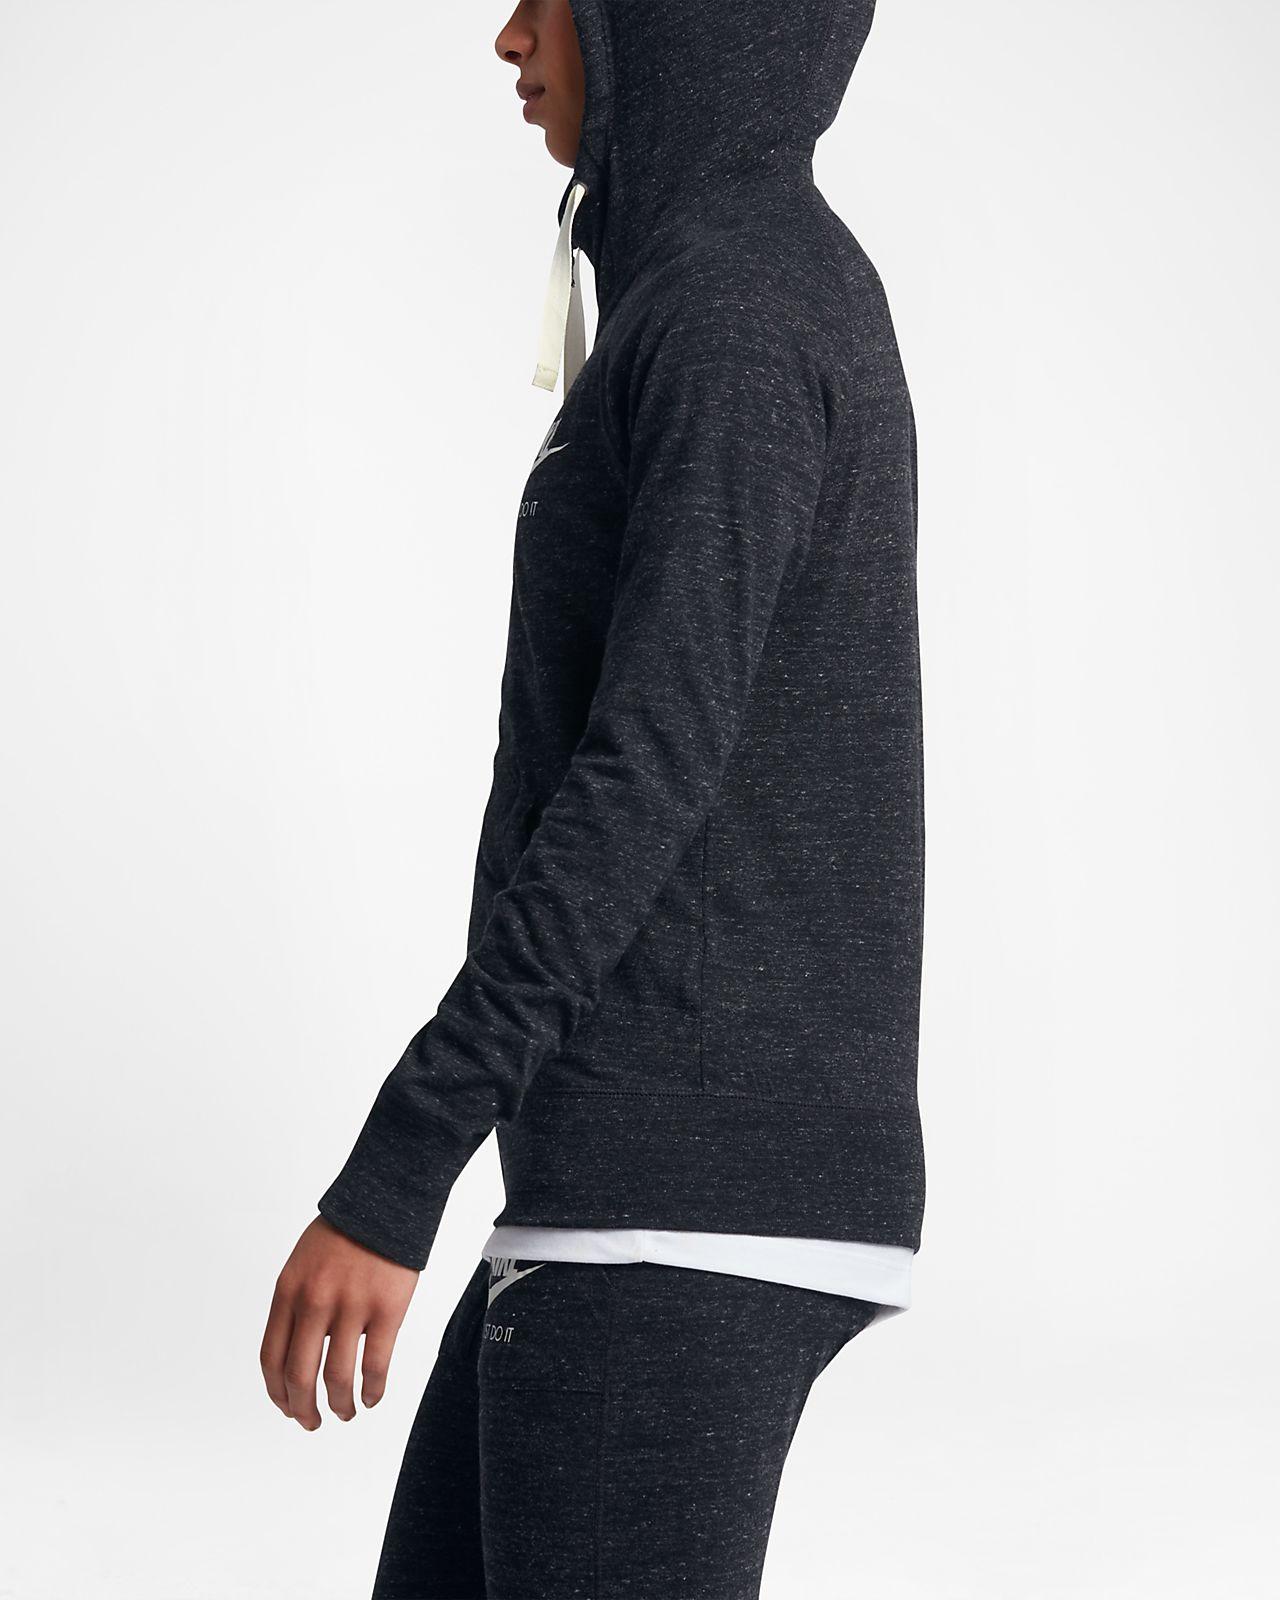 644ab5bd14353f Damska rozpinana bluza z kapturem Nike Sportswear Gym Vintage. Nike ...